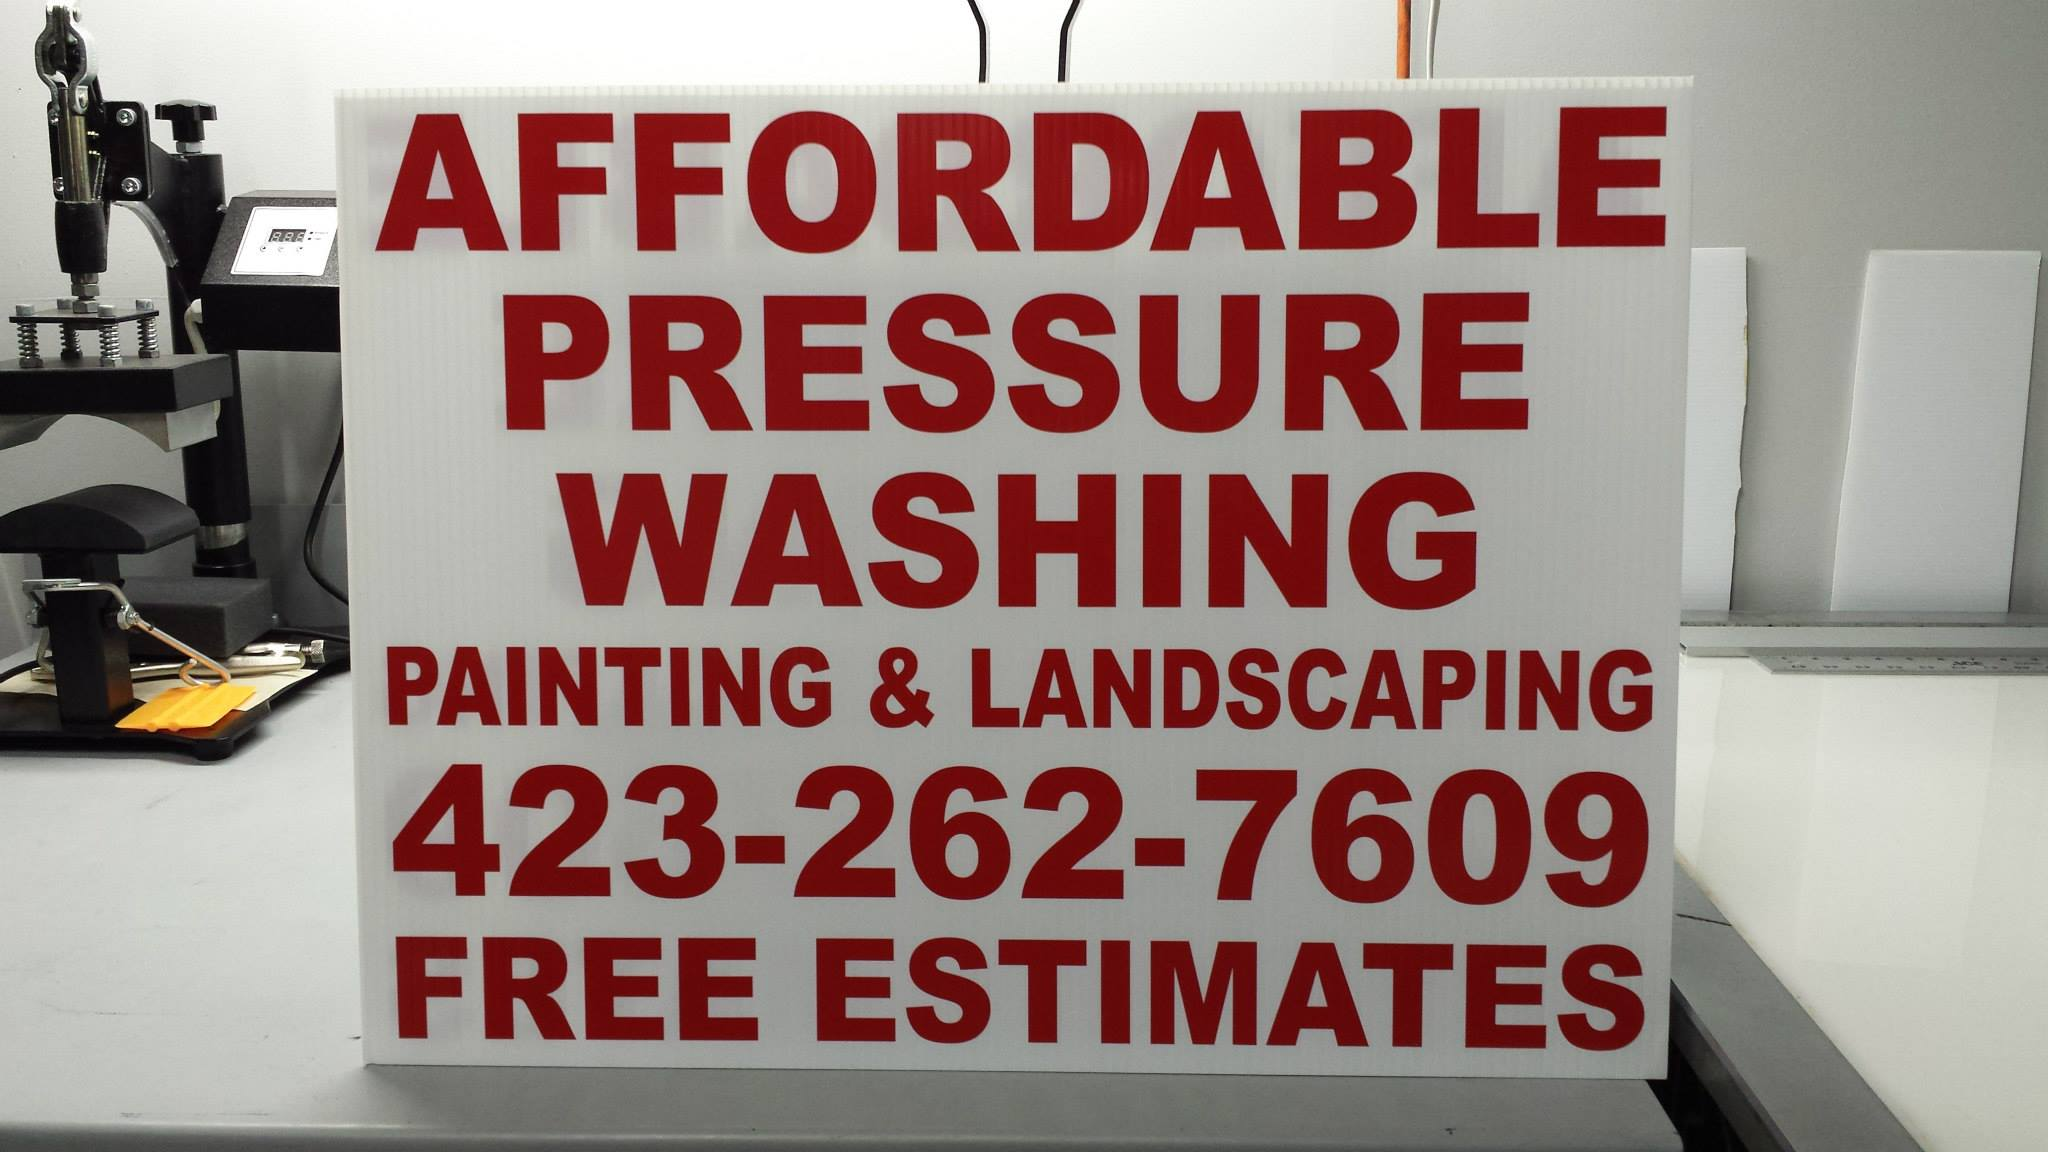 Affordable Pressure Washing